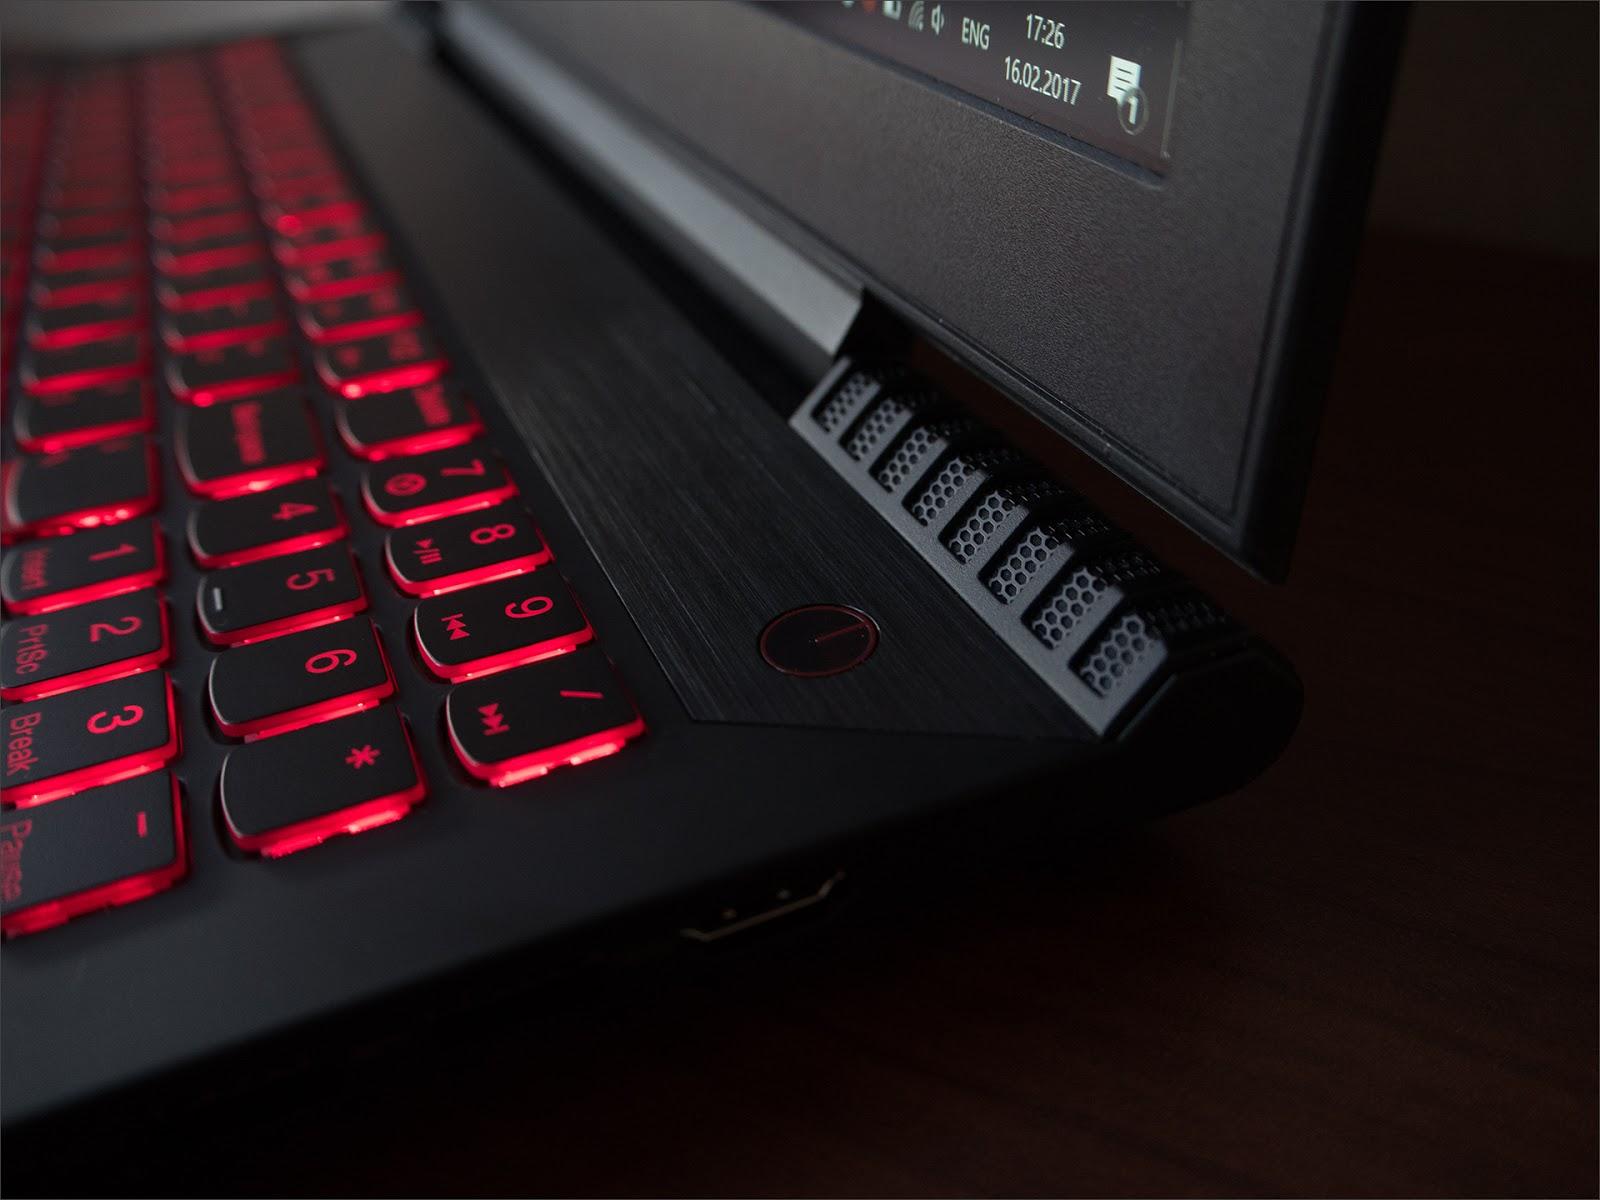 Балансируем на грани разумного с Lenovo Y520 - 1